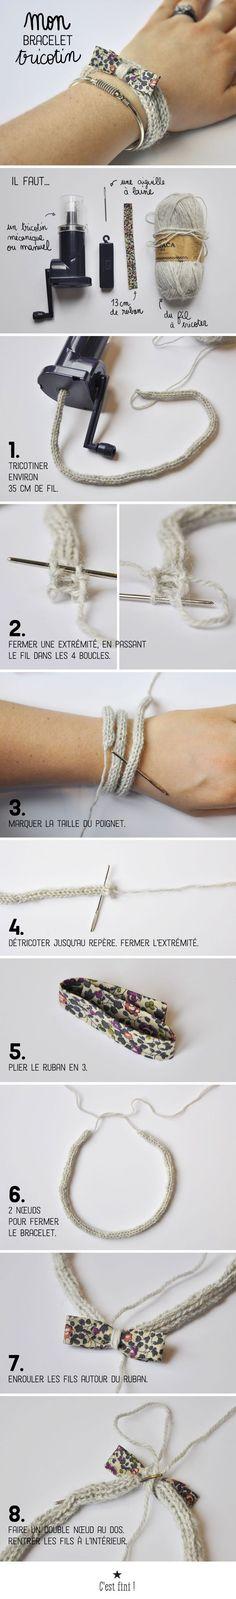 Tendance+Joaillerie+2017++–+Tutoriel+bracelet+tricotin